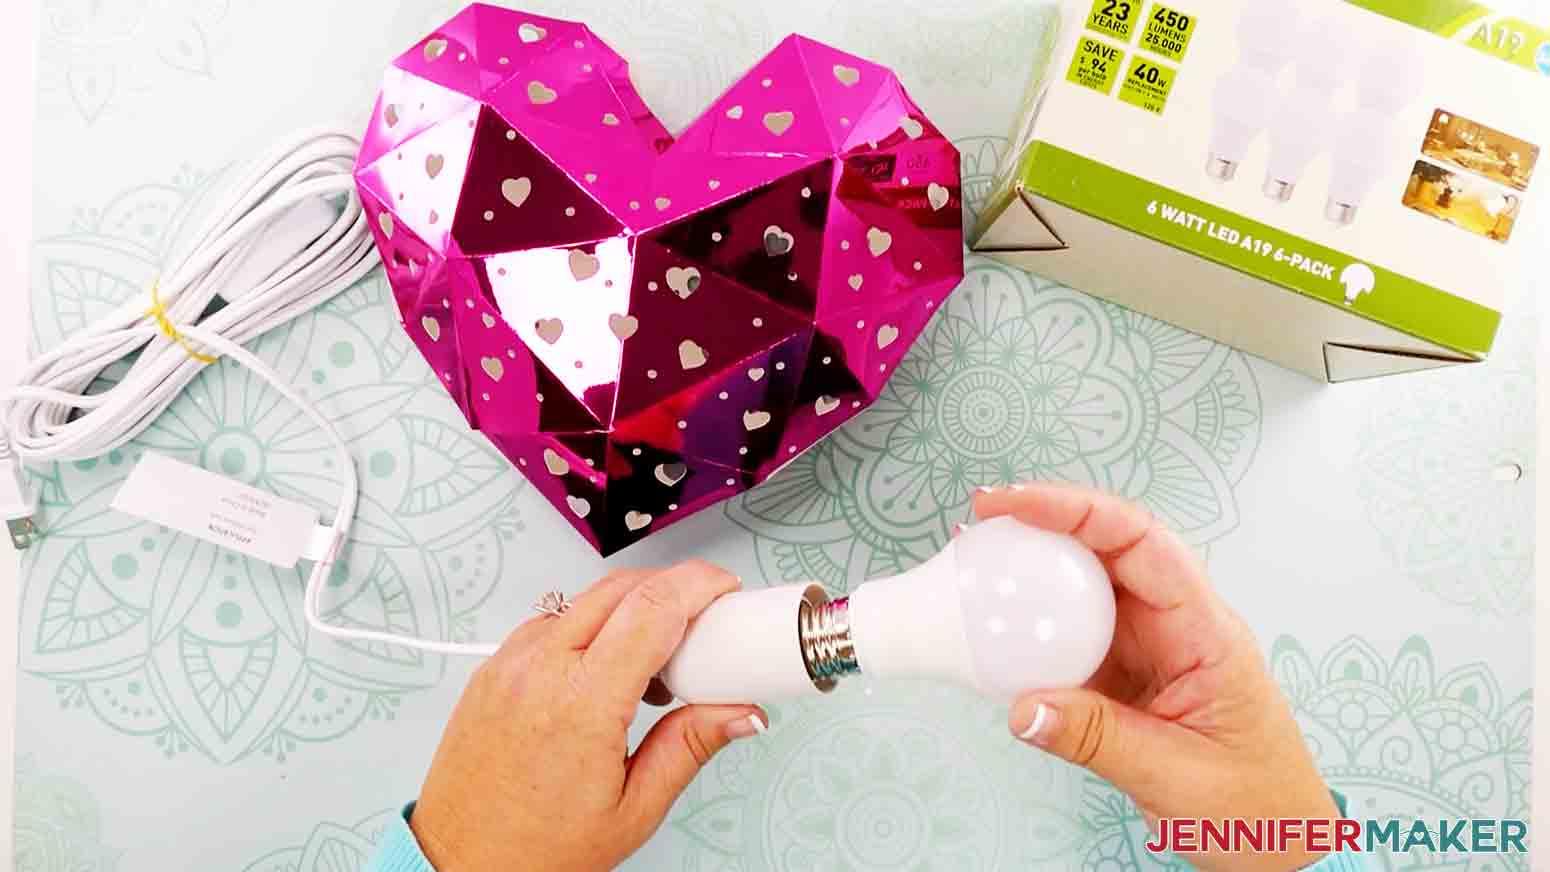 screwing in light bulb to light the heart lantern